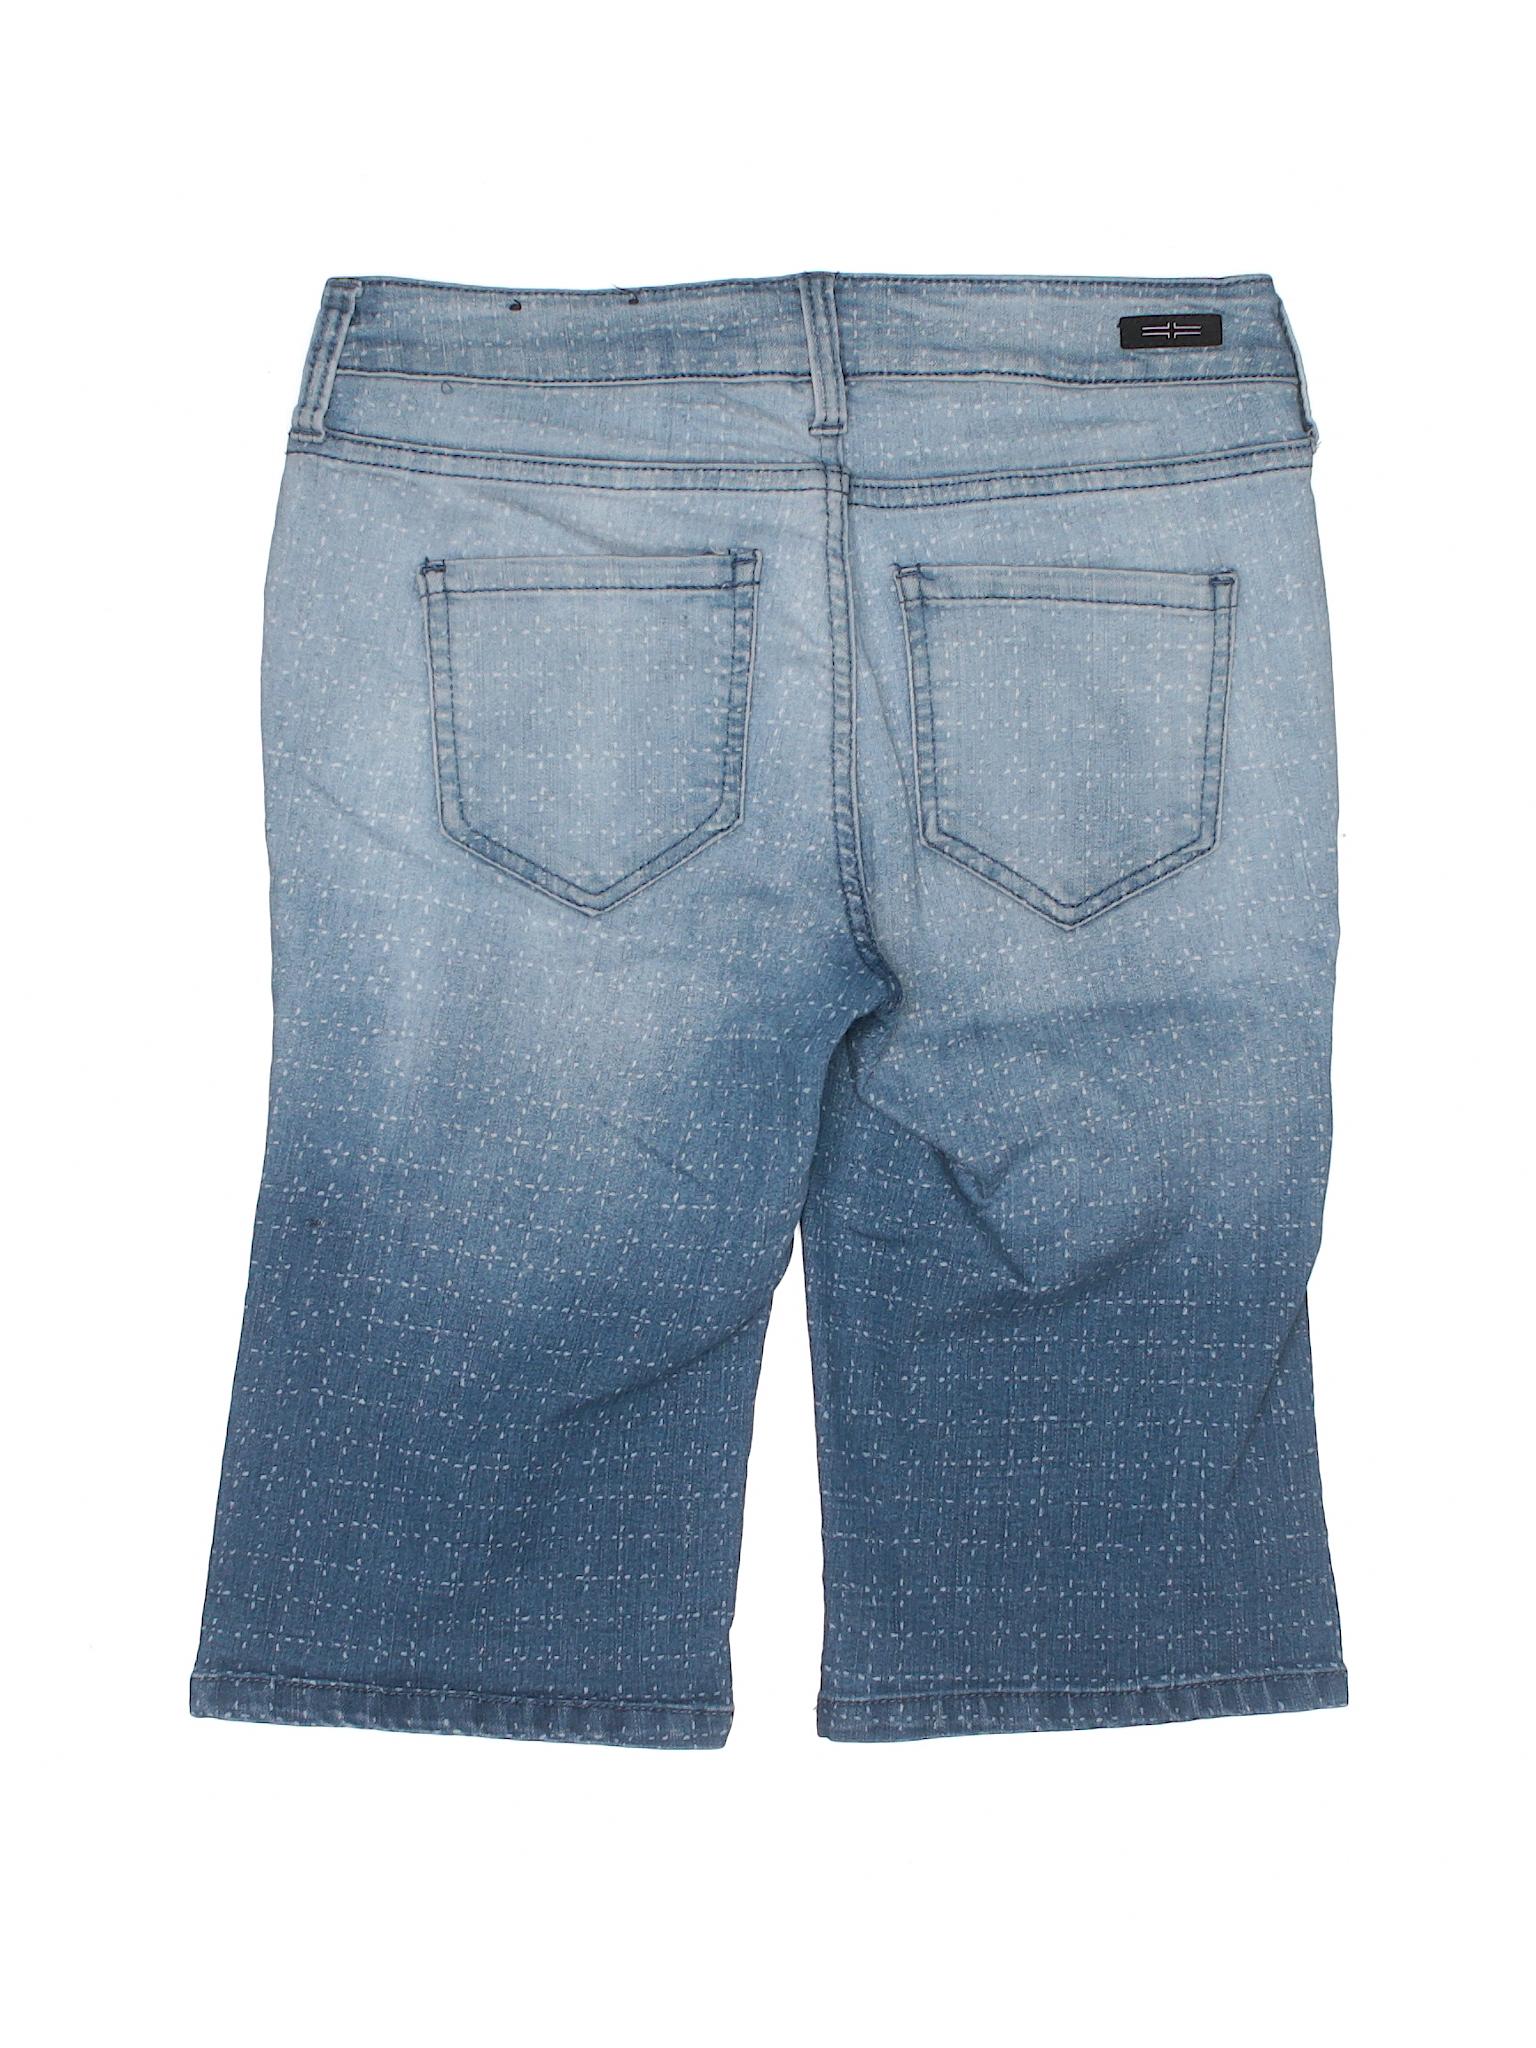 Denim Company Leisure winter Jeans Shorts Liverpool qnwnFA6B